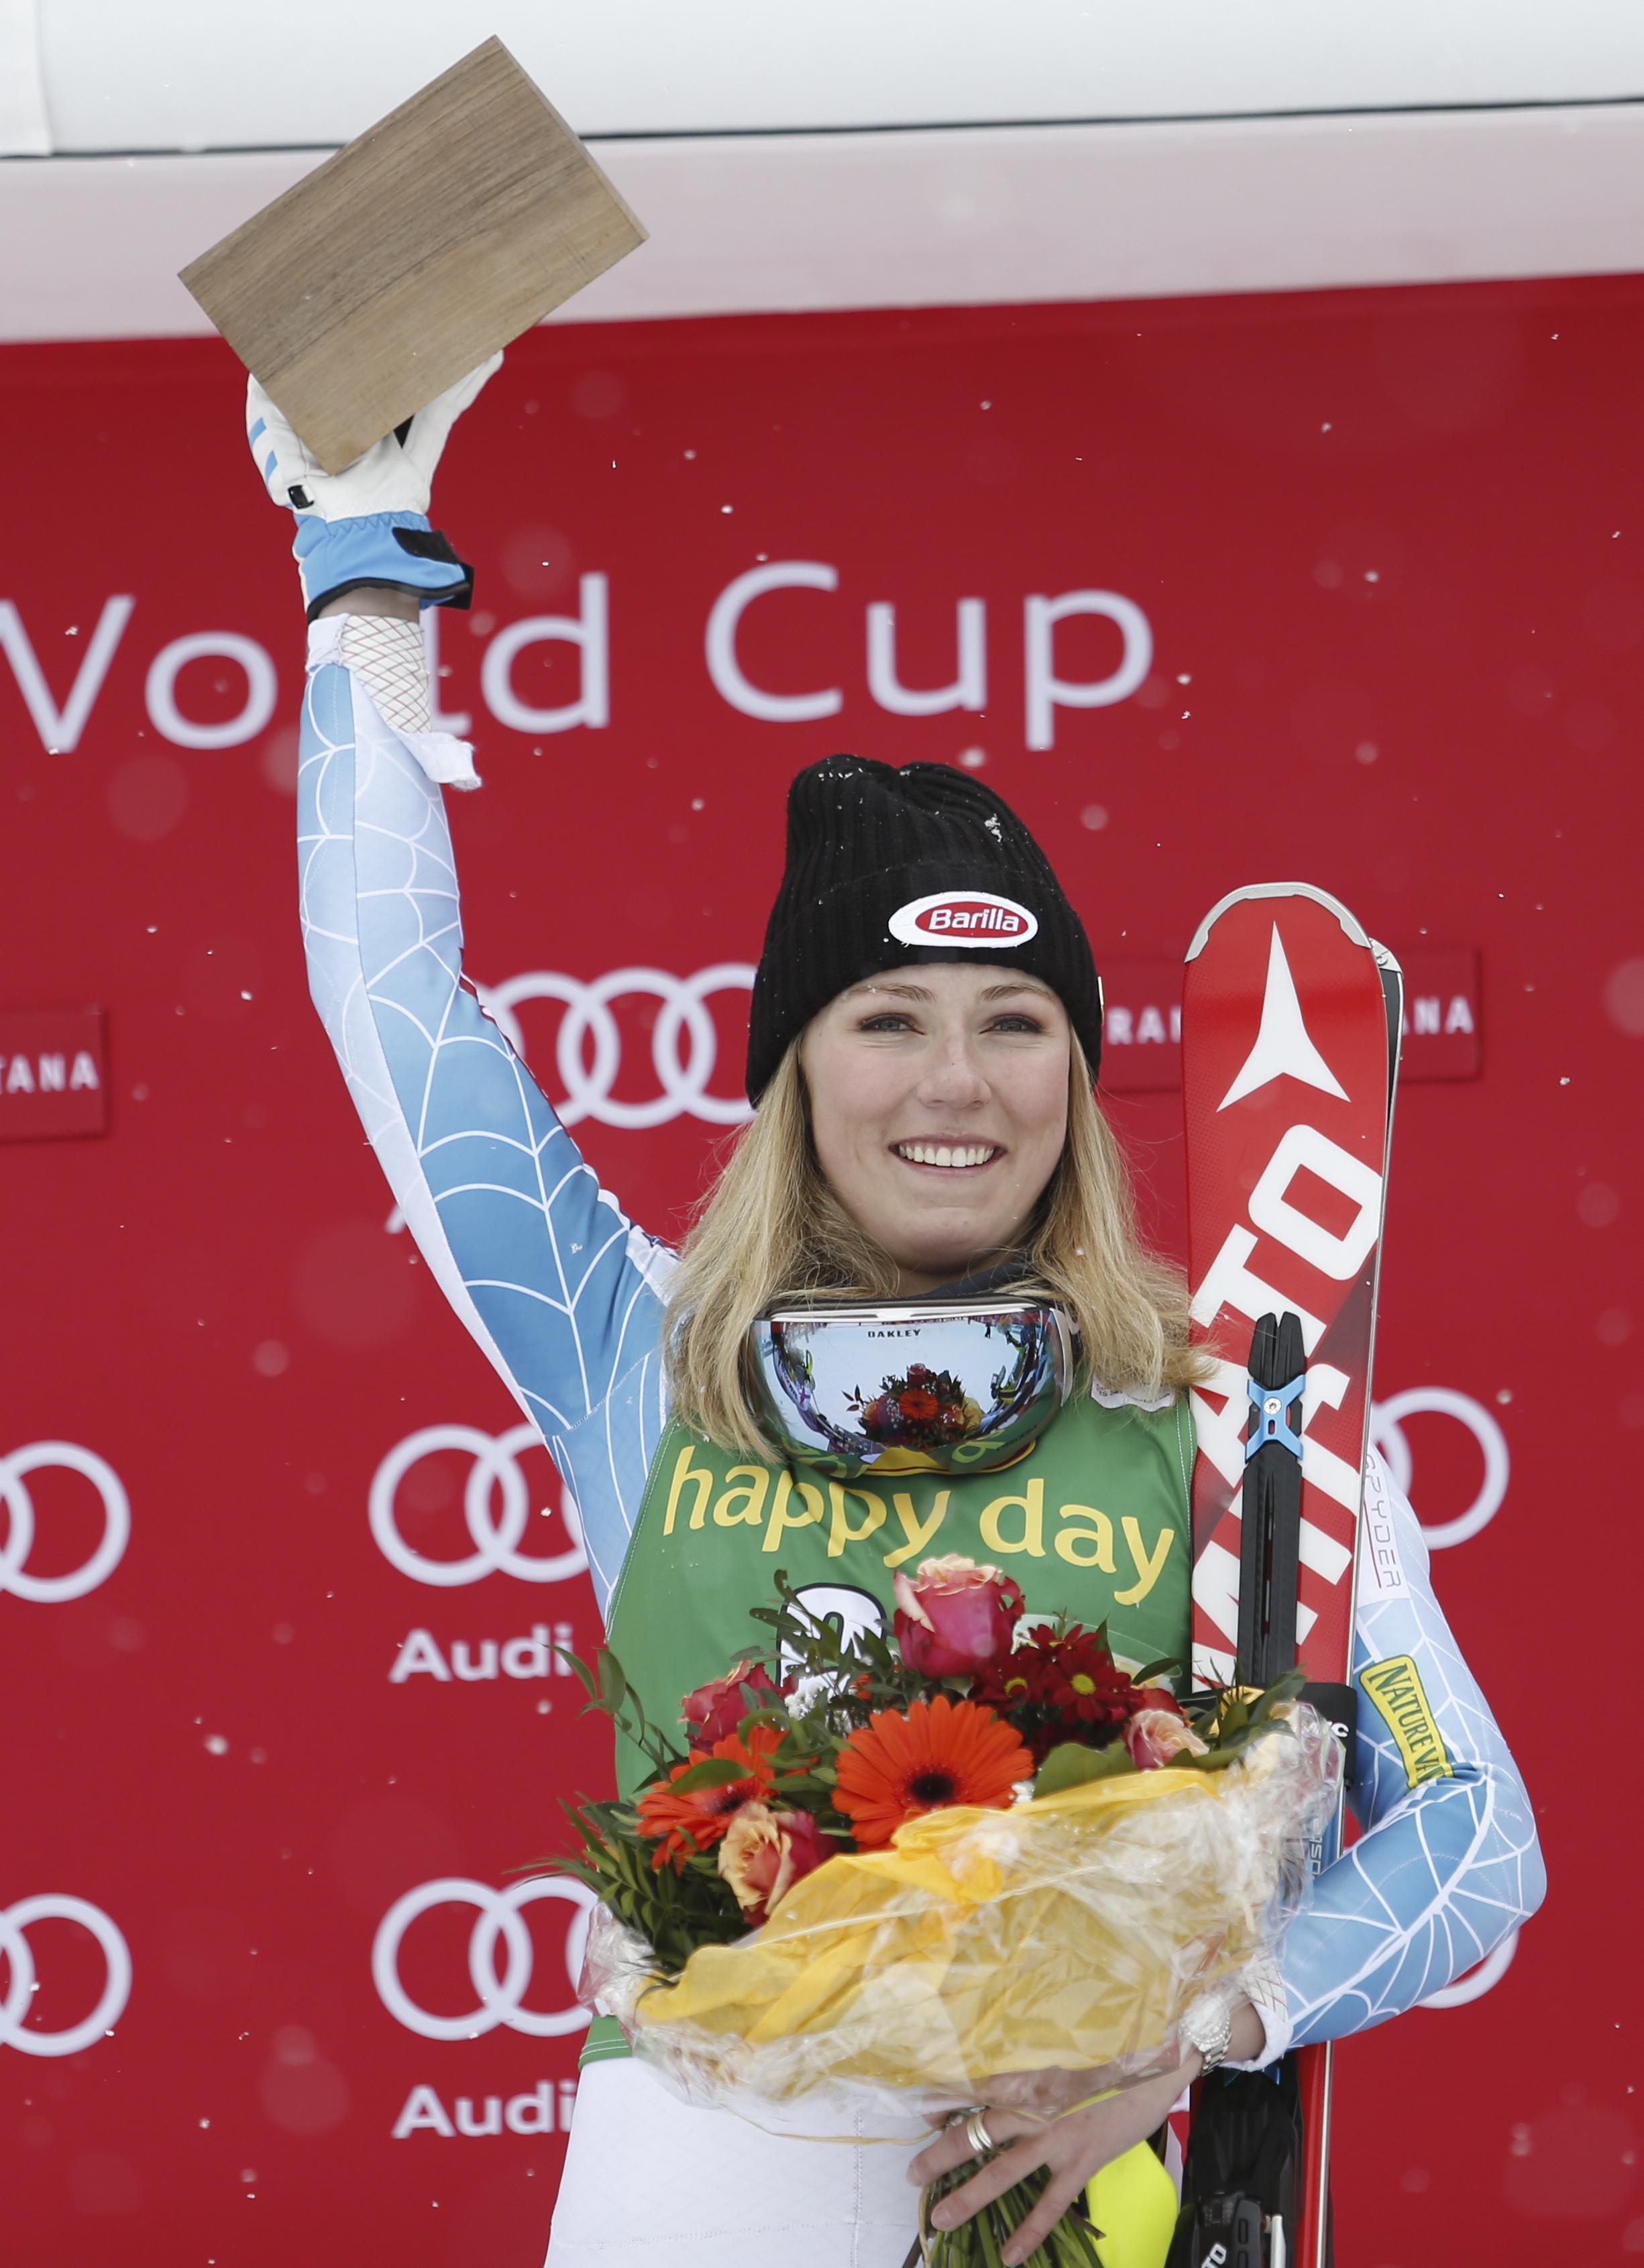 switzerland_alpine_skiing_world_cup-48c4_r255.jpeg